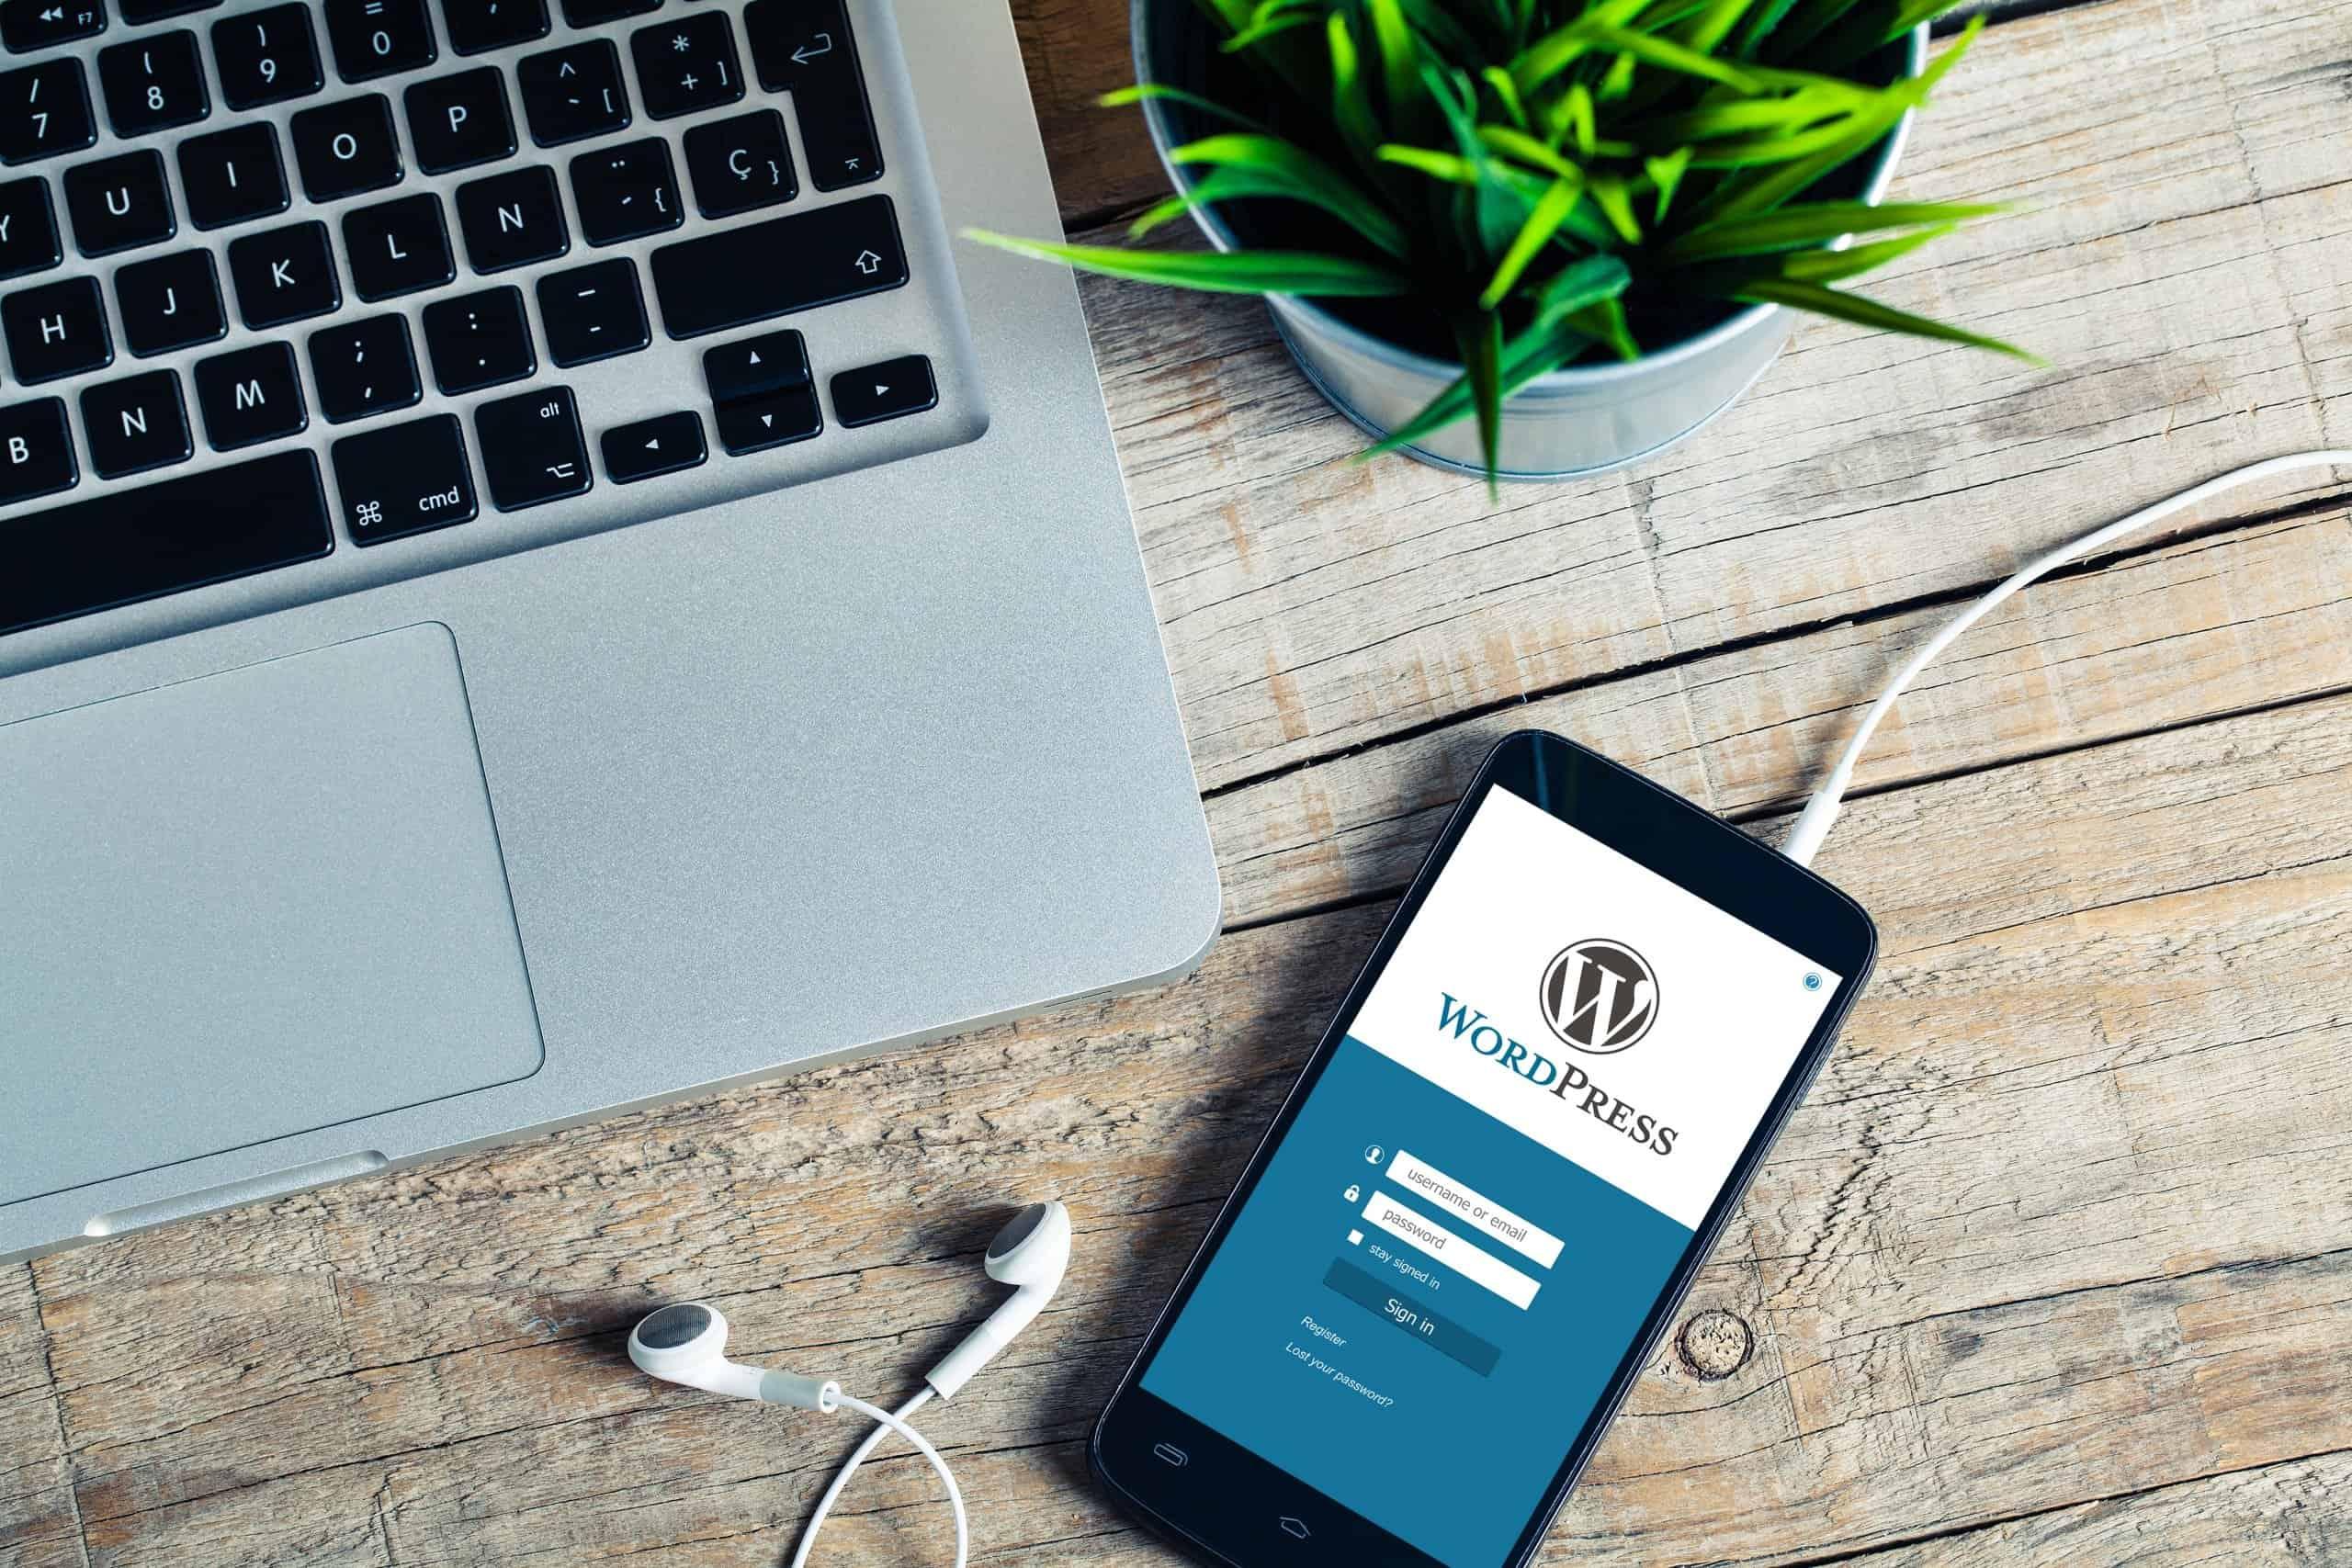 Publishing on WordPress through mobile